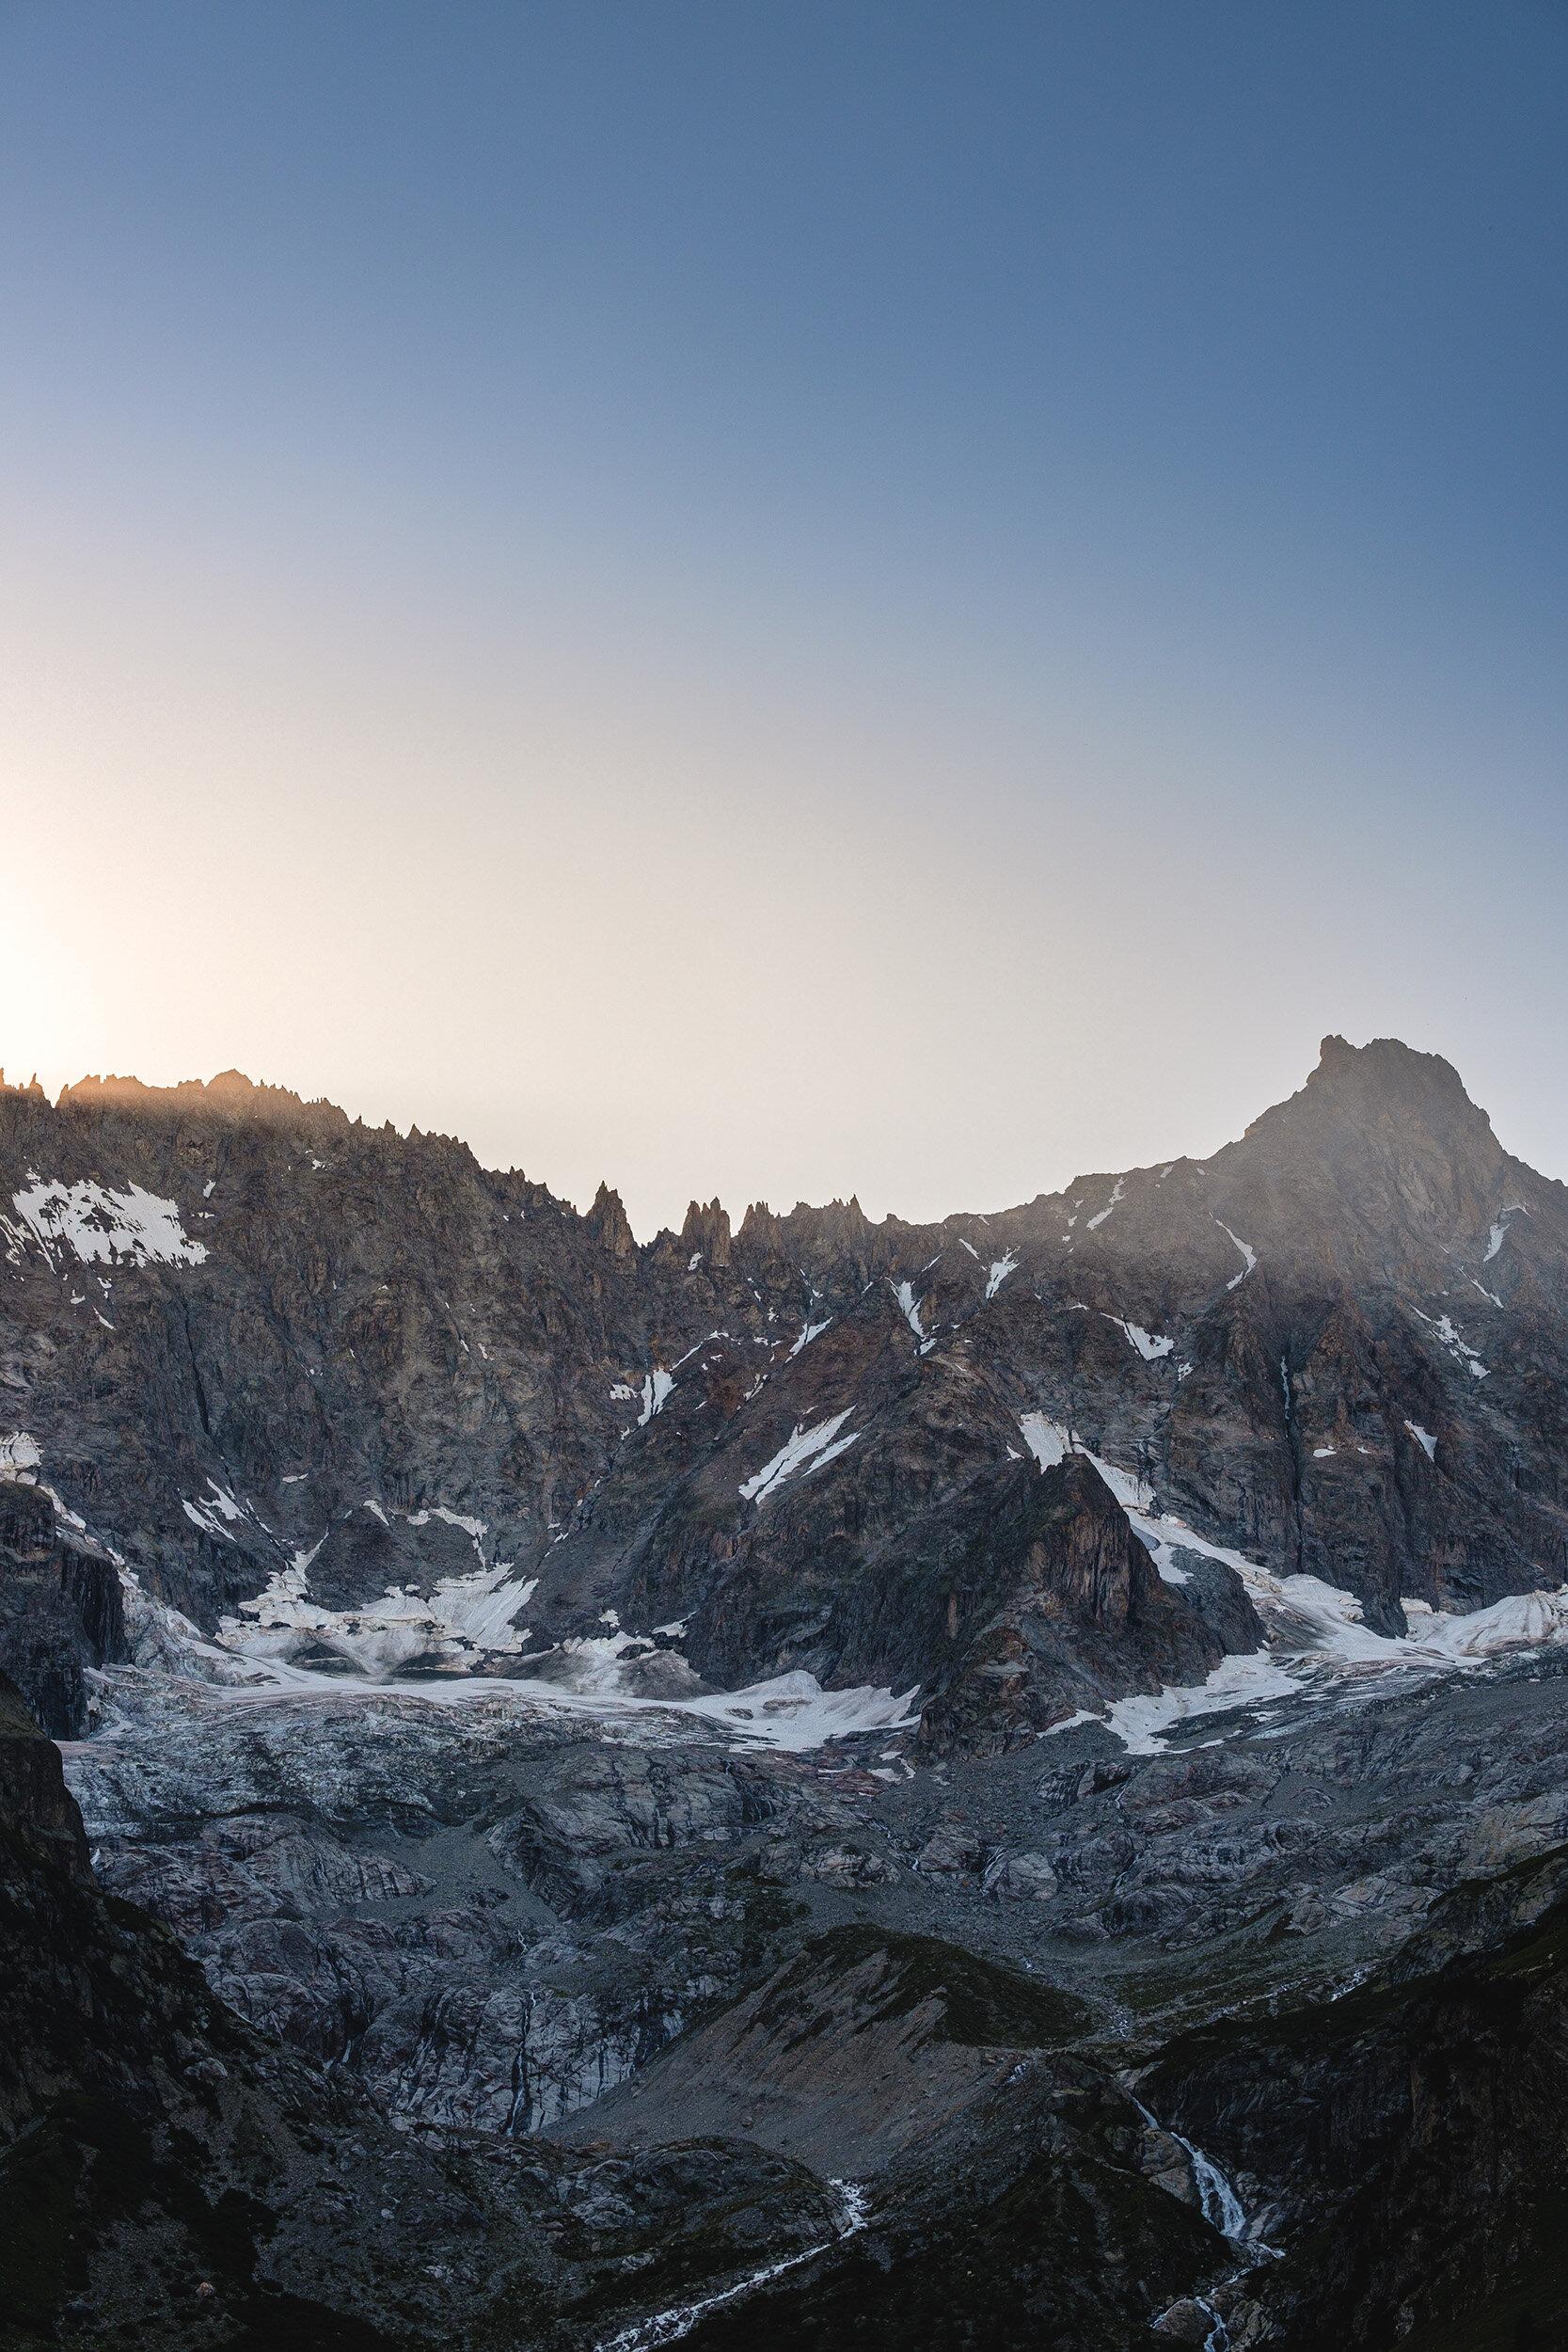 Swiss Alps - Mont Blanc Massif-11.jpg